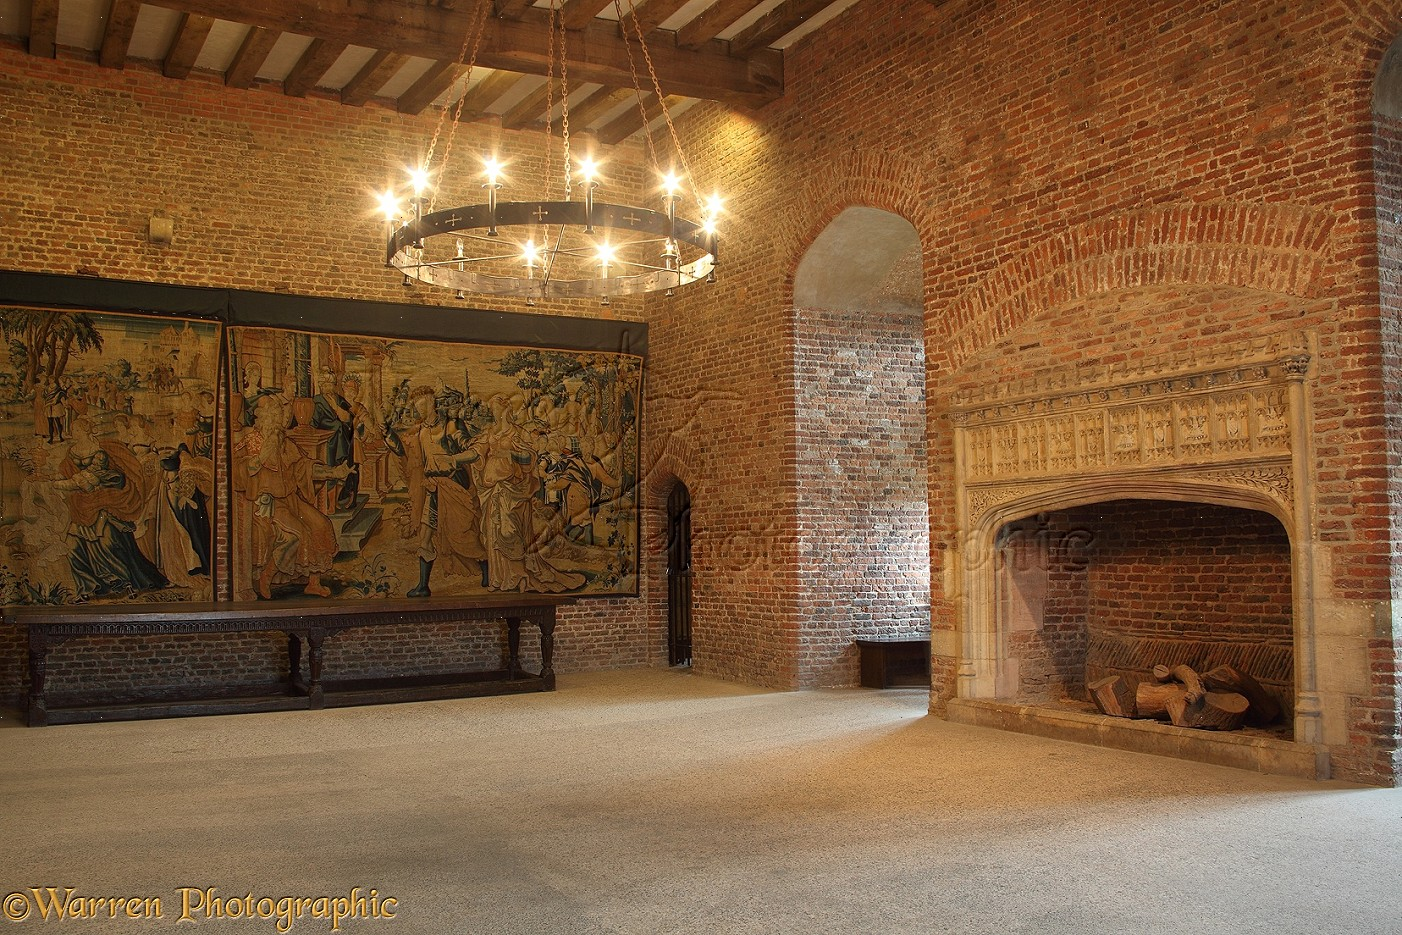 Tattershall castle interior photo - WP29097